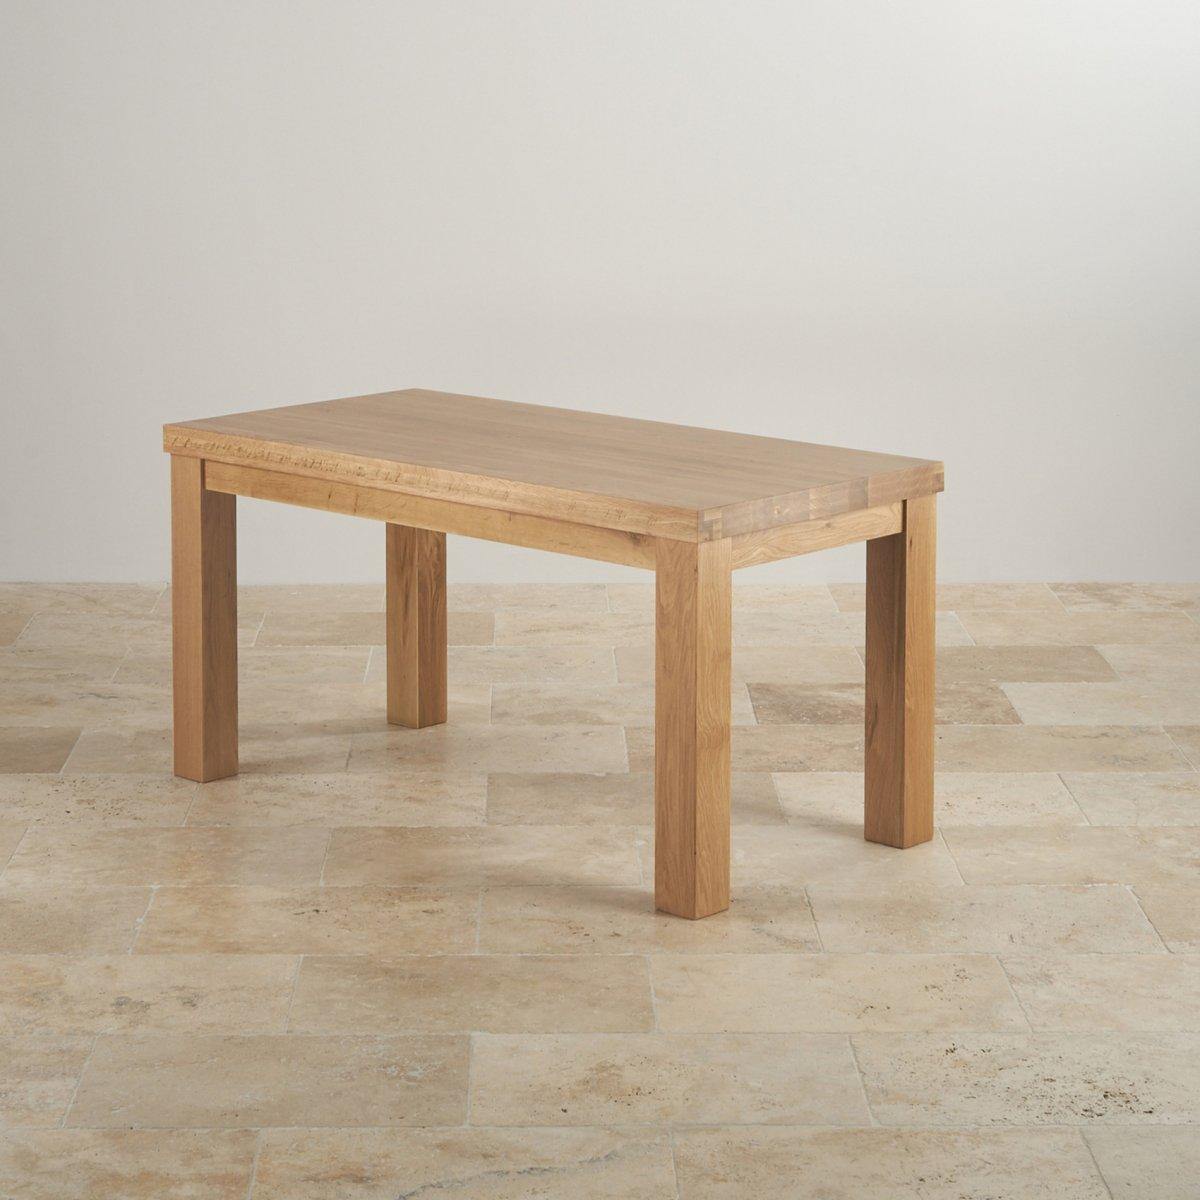 Fresco 6ft Solid Oak Dining Table 6 Cream Leather Braced